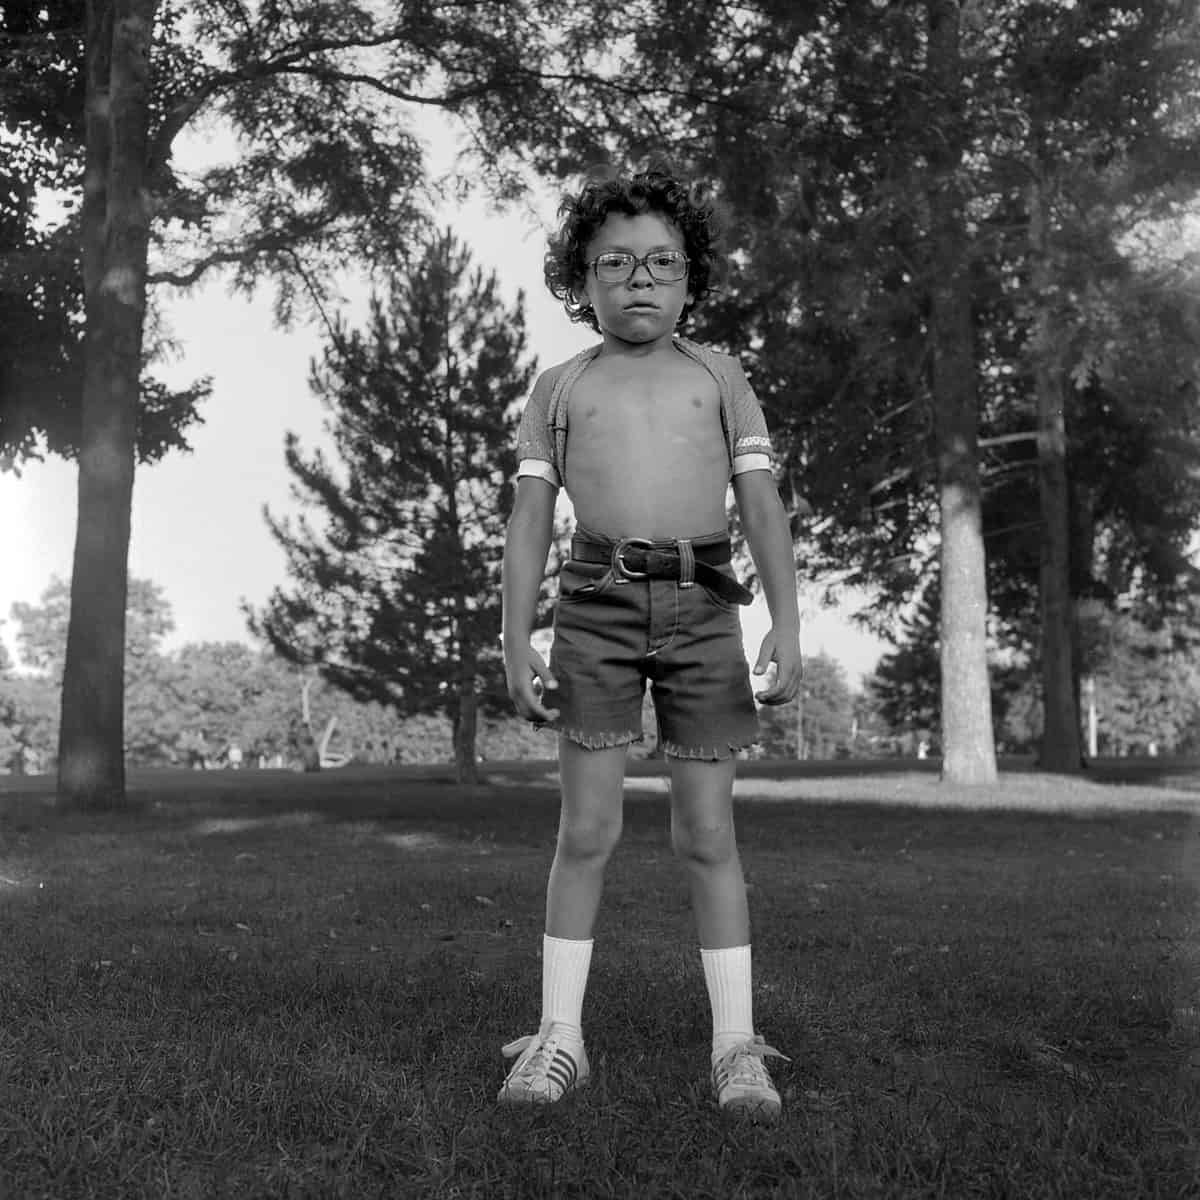 Ricky, Denver, 1978 Photographie ©Ricardo Bloch